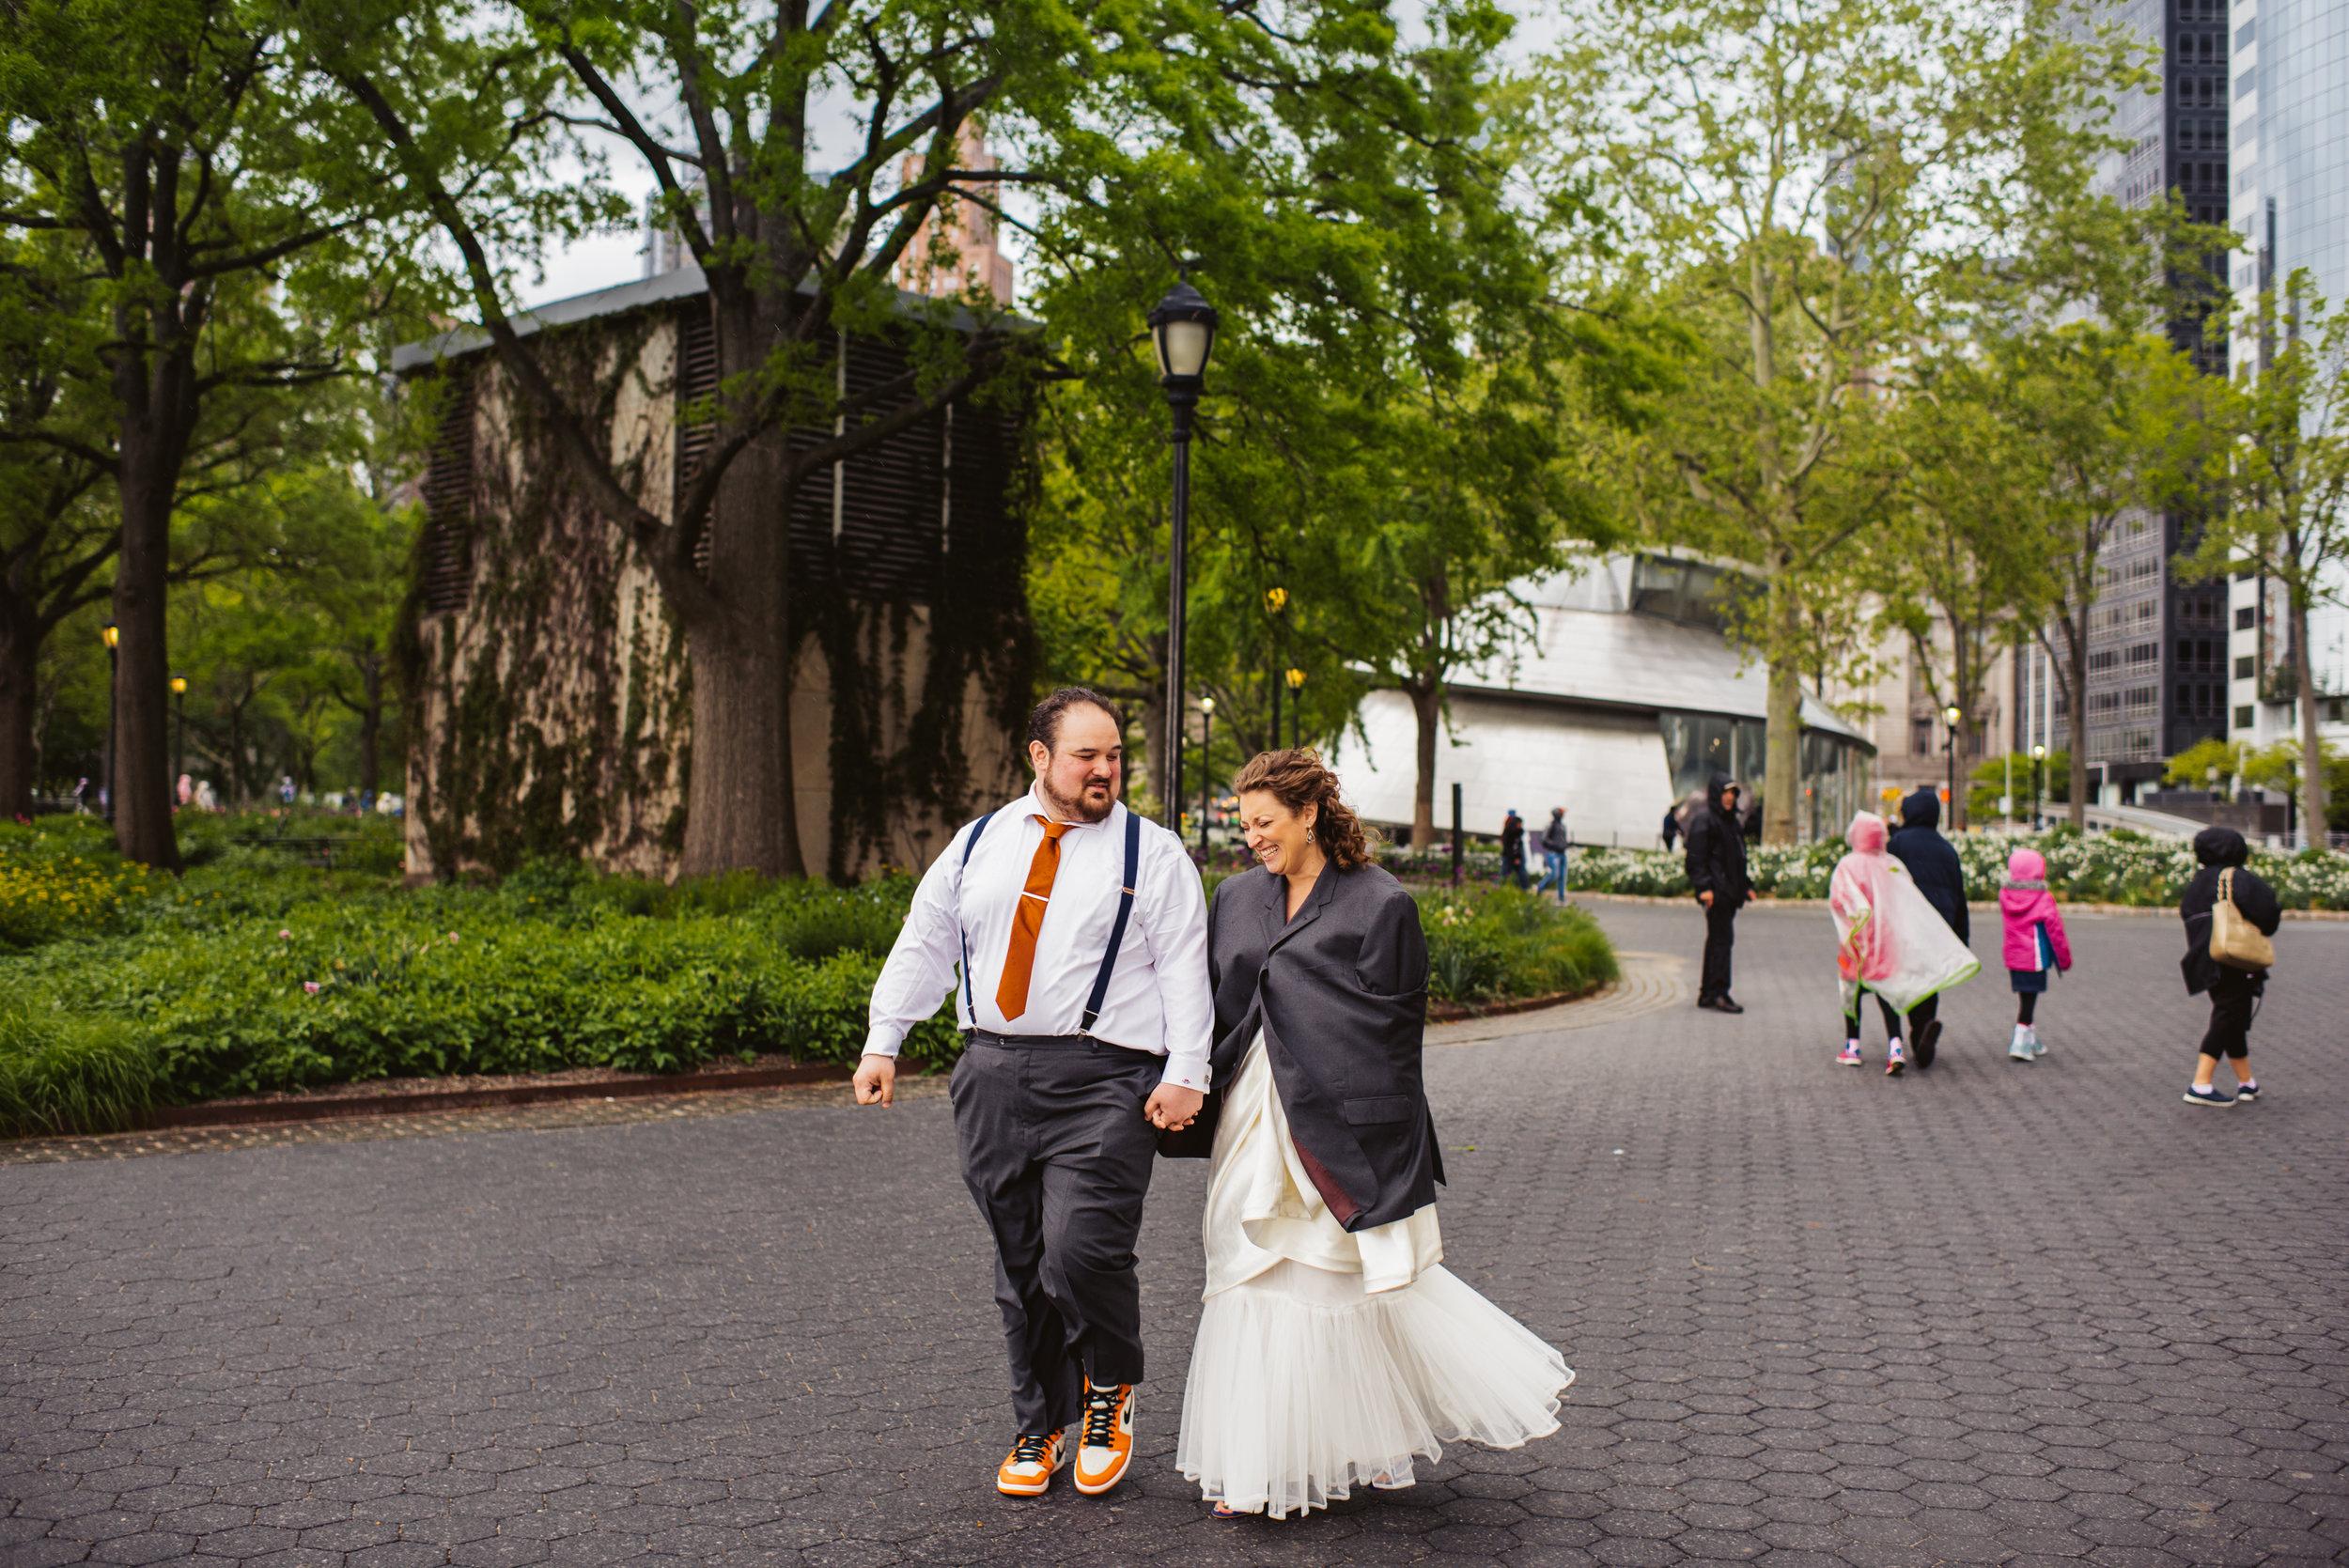 LIZA & JON - BATTERY PARK WEDDING - NYC INTIMATE WEDDING PHOTOGRAPHER - CHI-CHI AGBIM-175.jpg